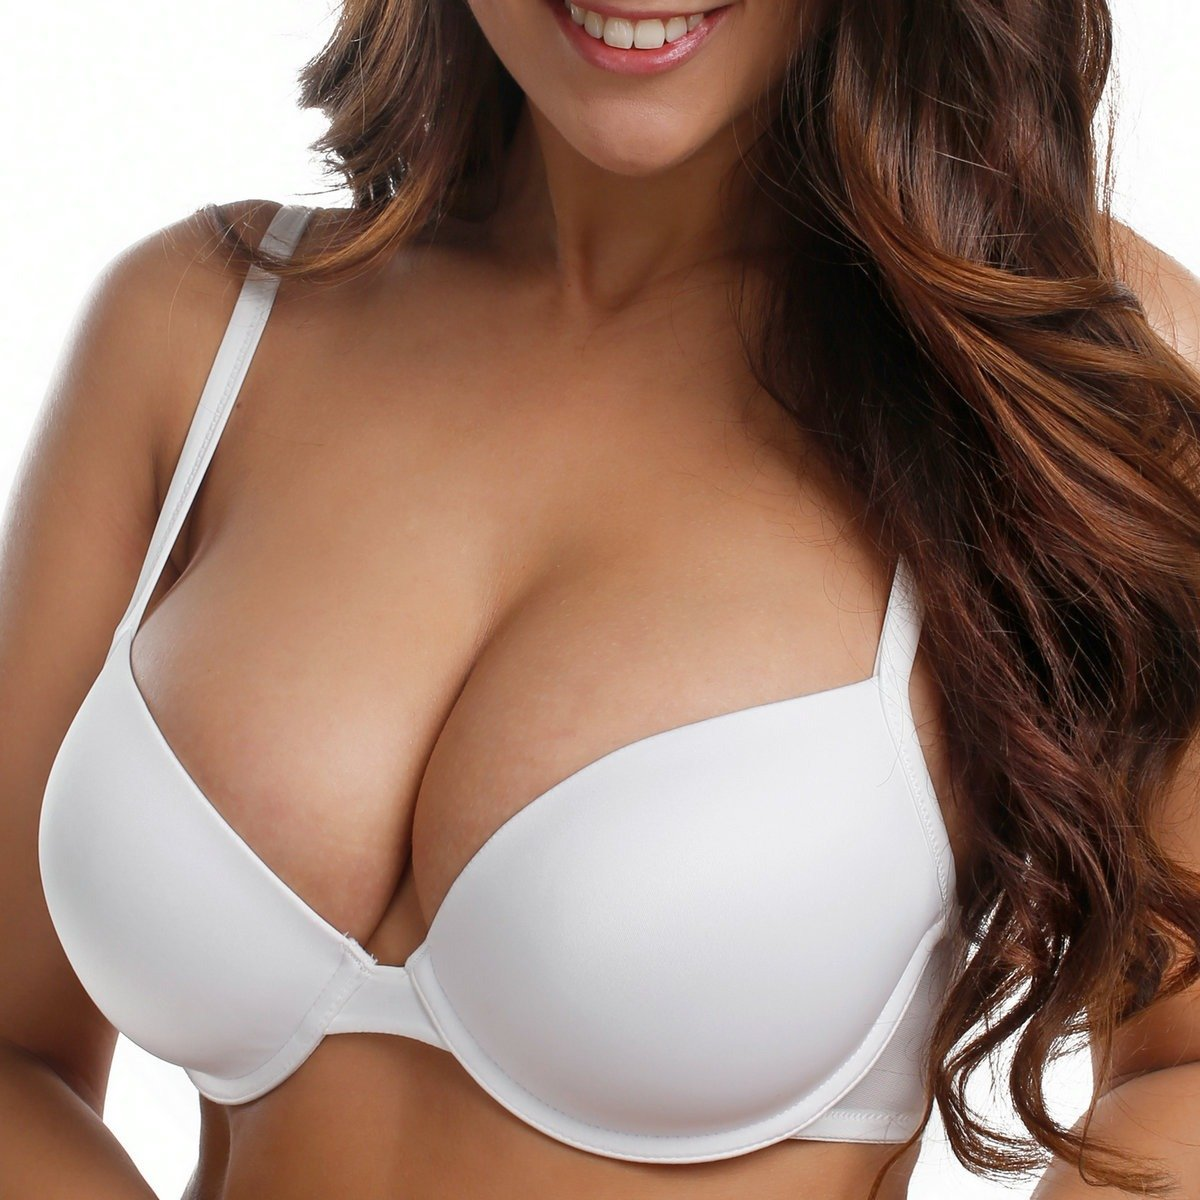 c-cup-girls-boob